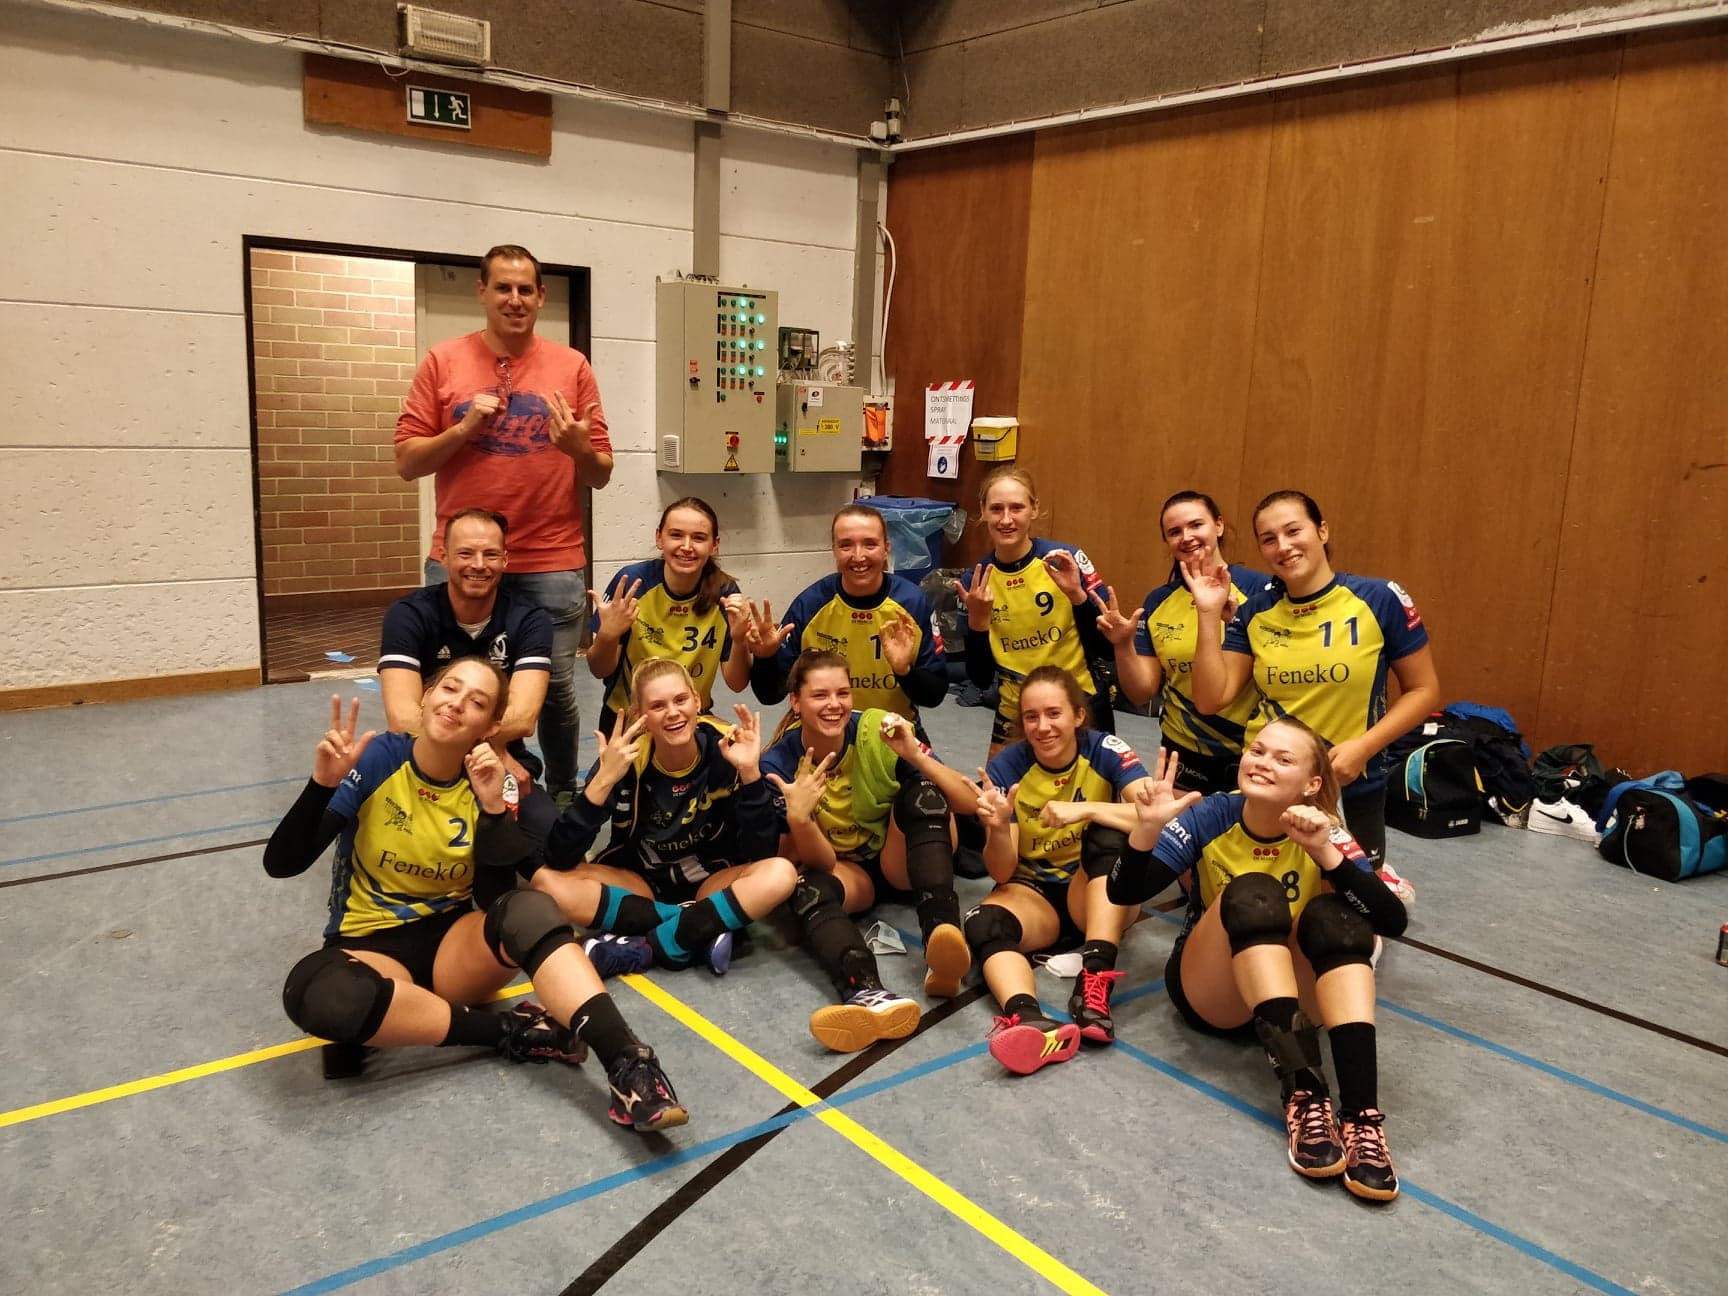 Promovendus VC Wolvertem Sporting gooit hoge ogen in competitie